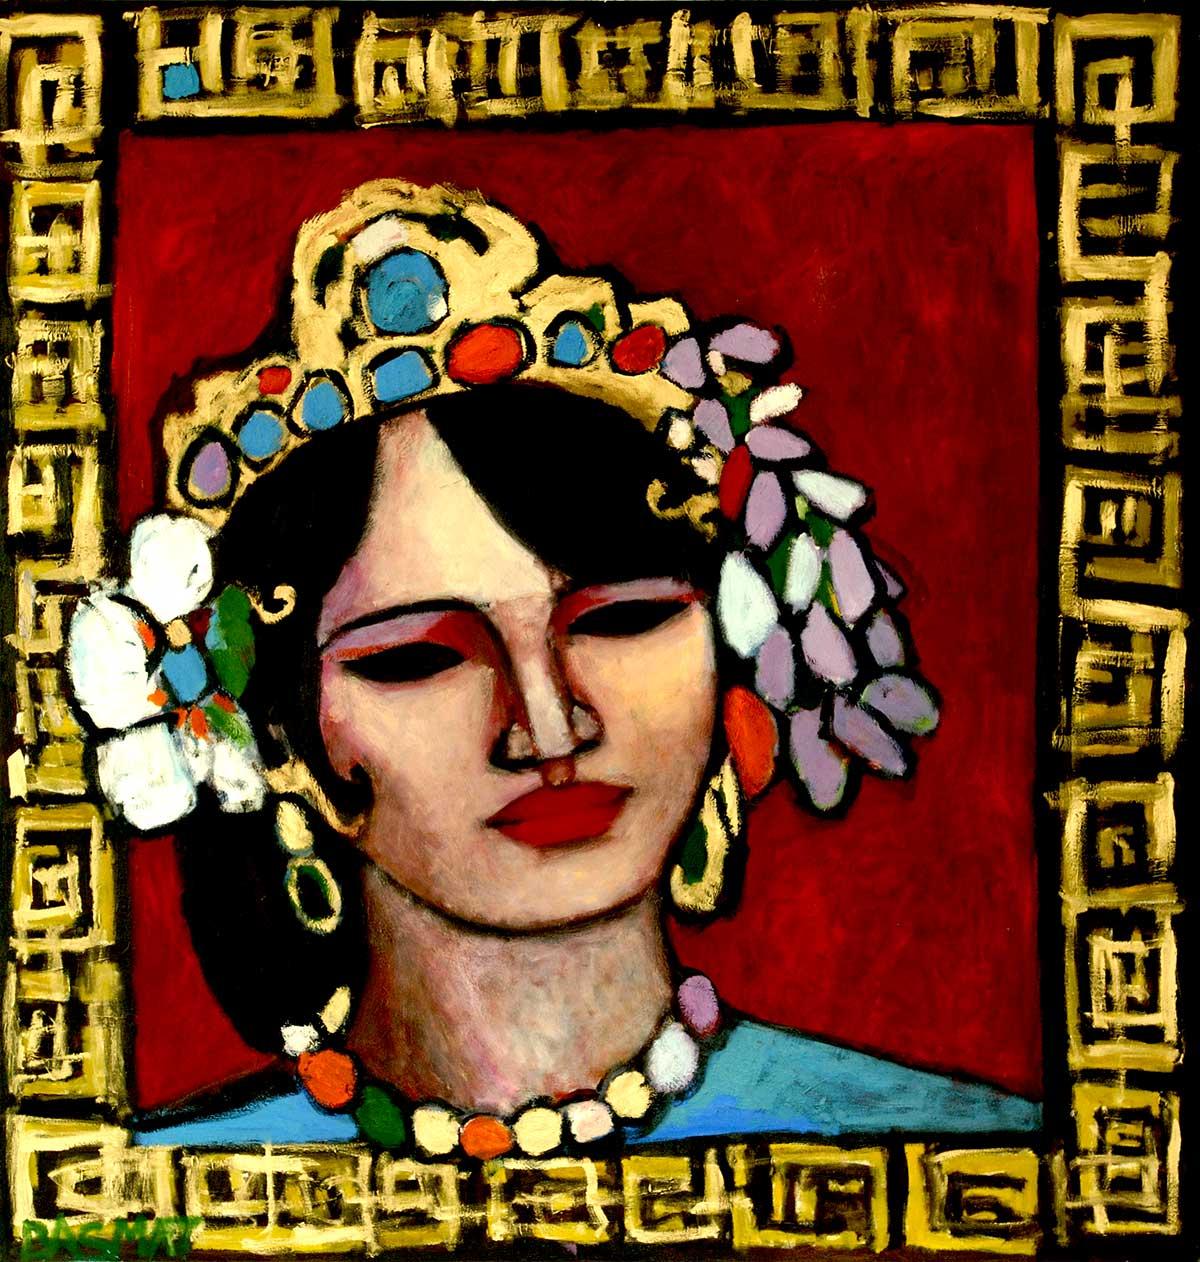 Princess  - 190cm x 180cm, Oil on Canvas